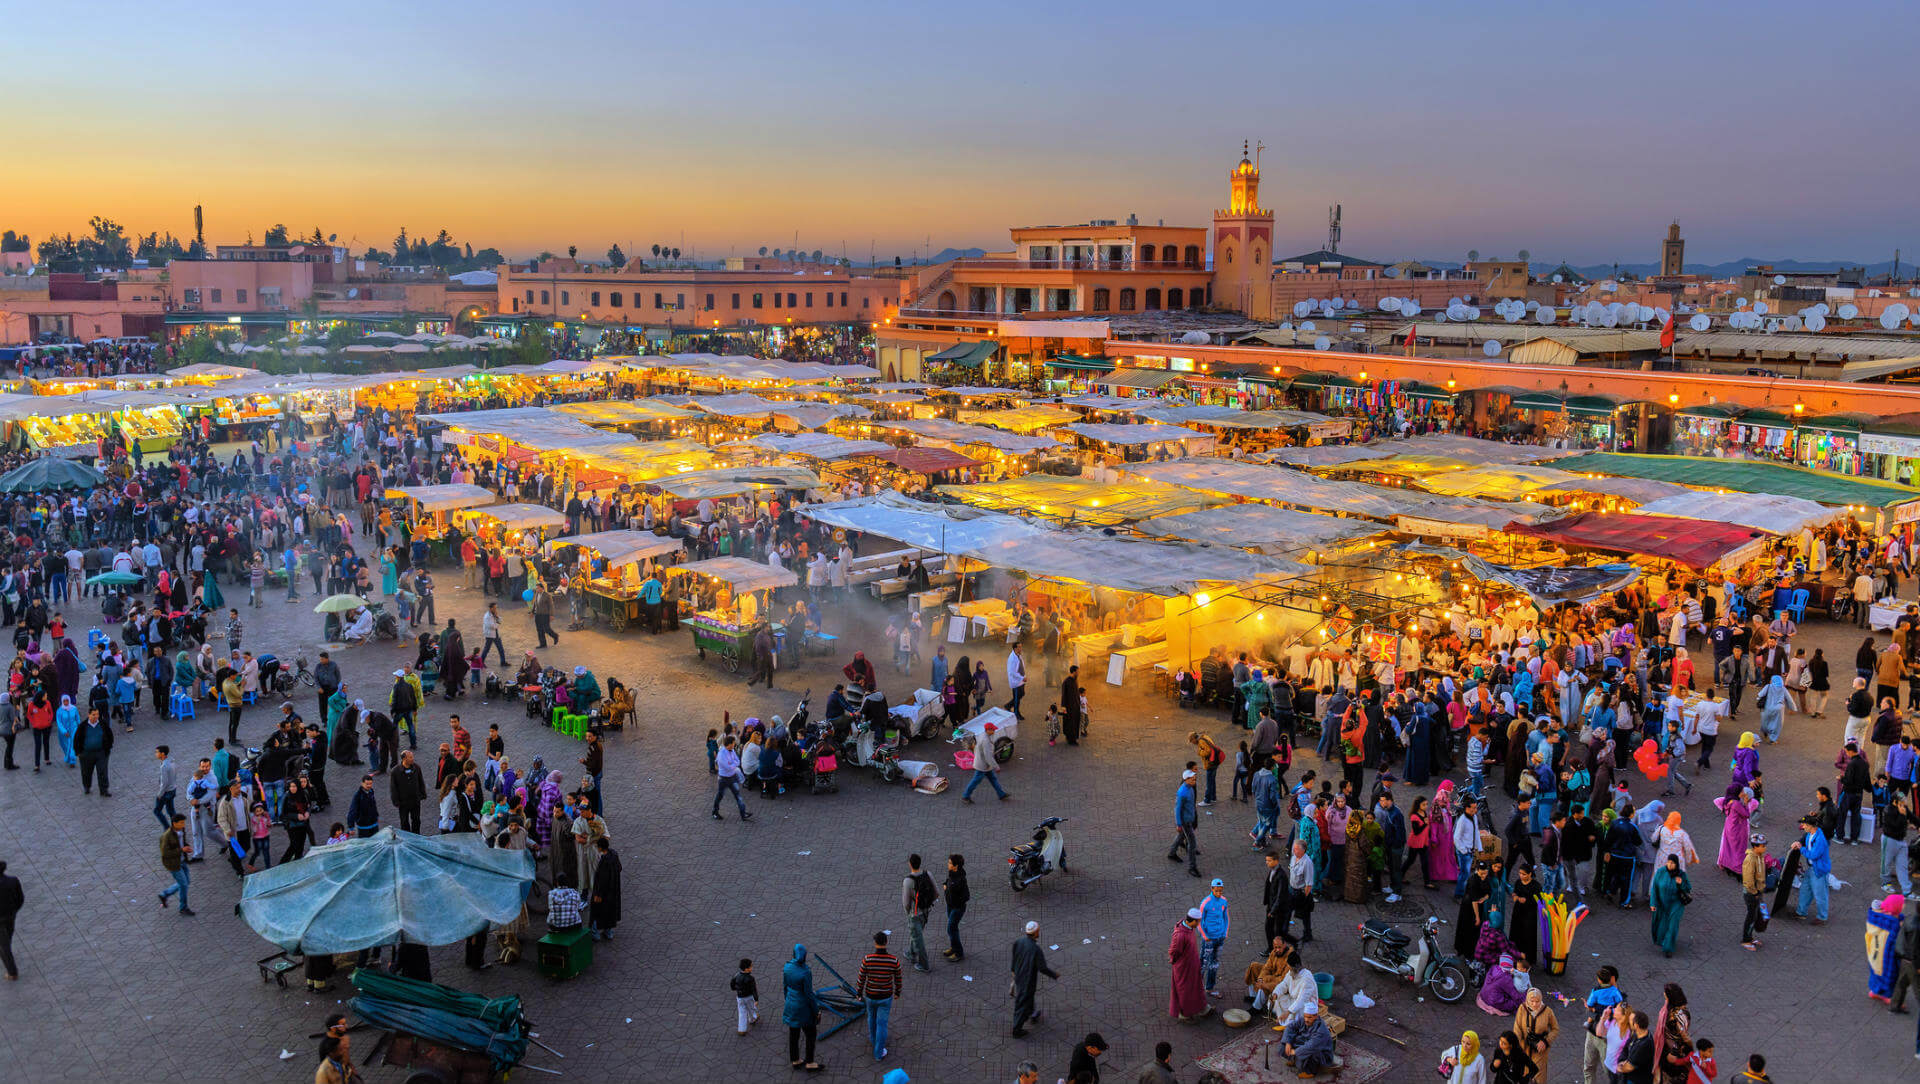 Viaje a Marrakech, Plaza Jamaa El Fna